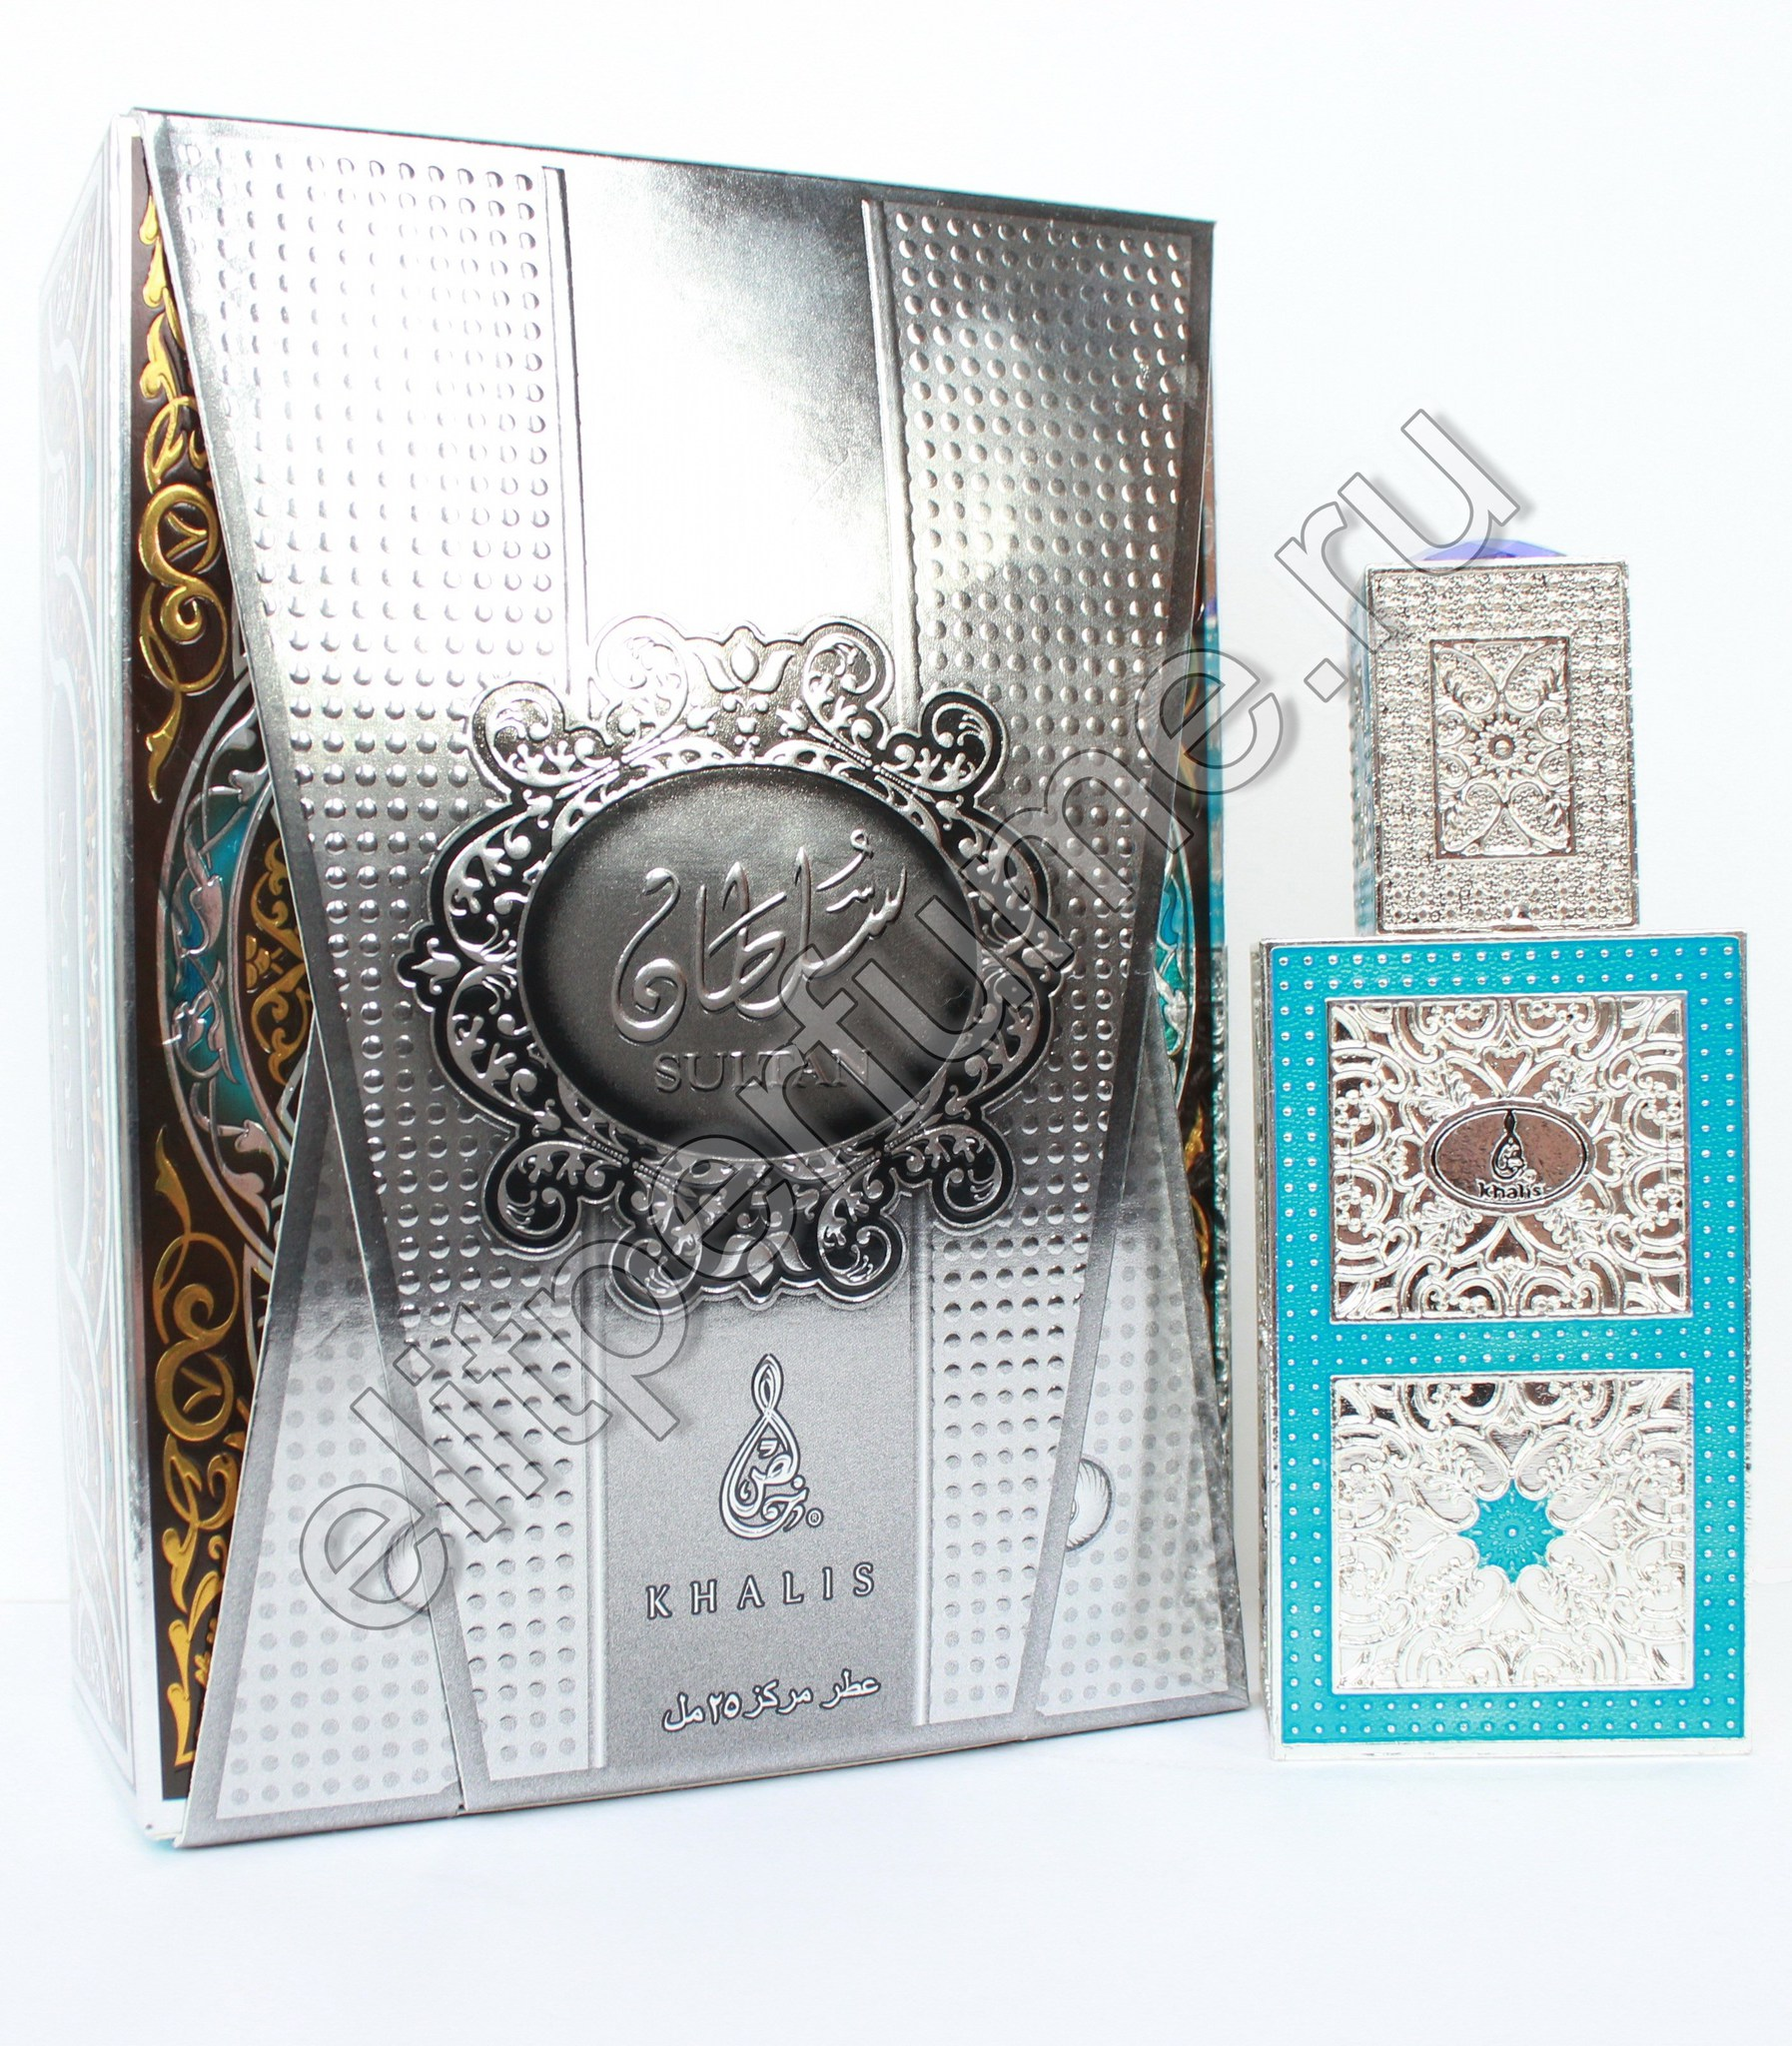 Sultan Султан Халис 25 мл арабские масляные духи от Халис Khalis Perfumes